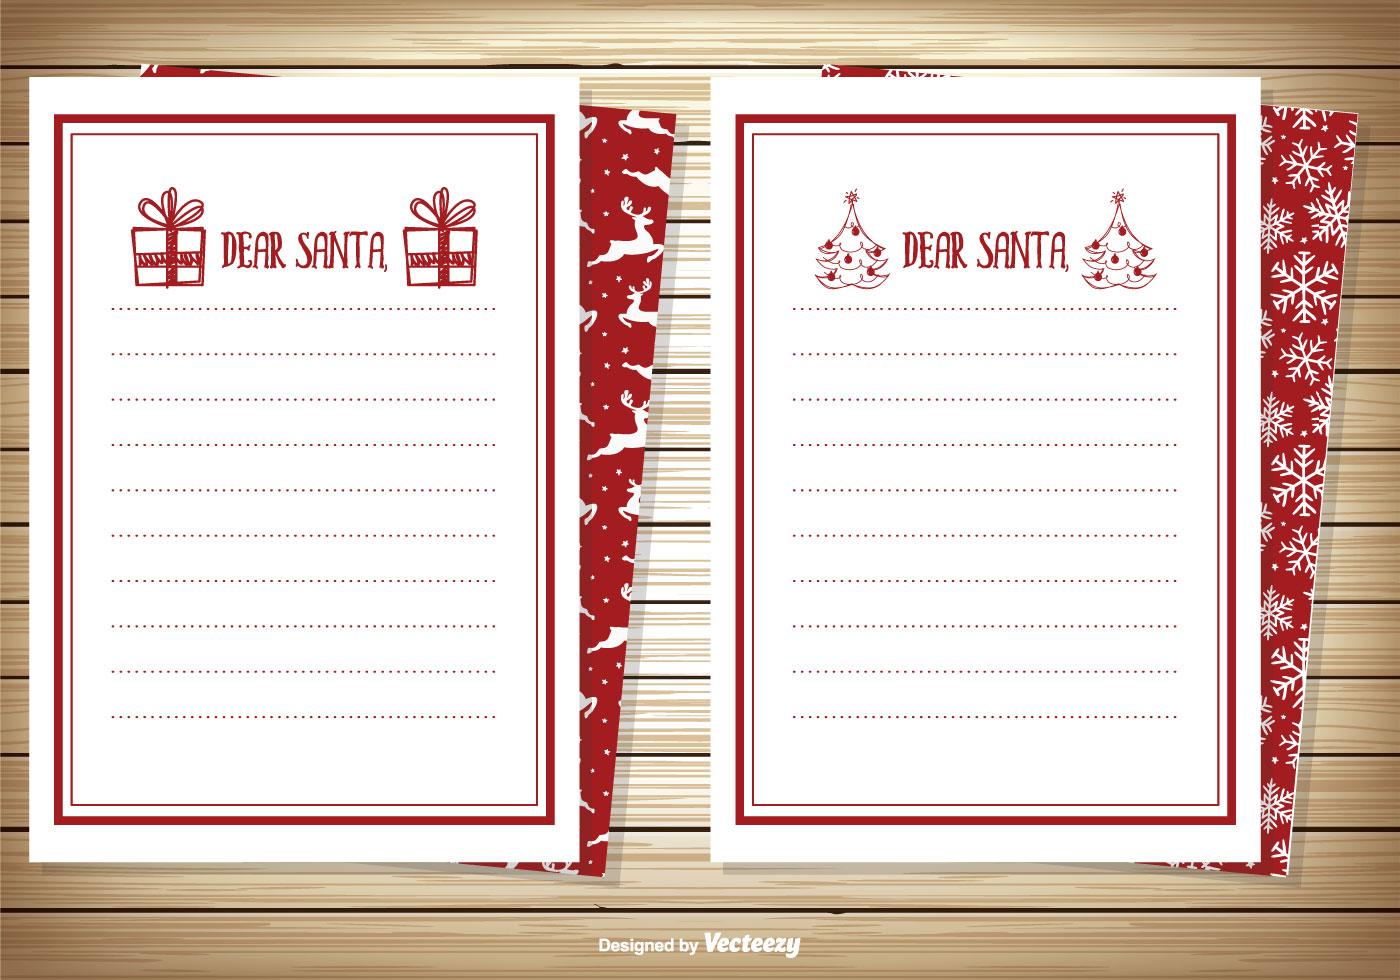 Dear Santa Note Card Set - Download Free Vector Art, Stock Graphics ...